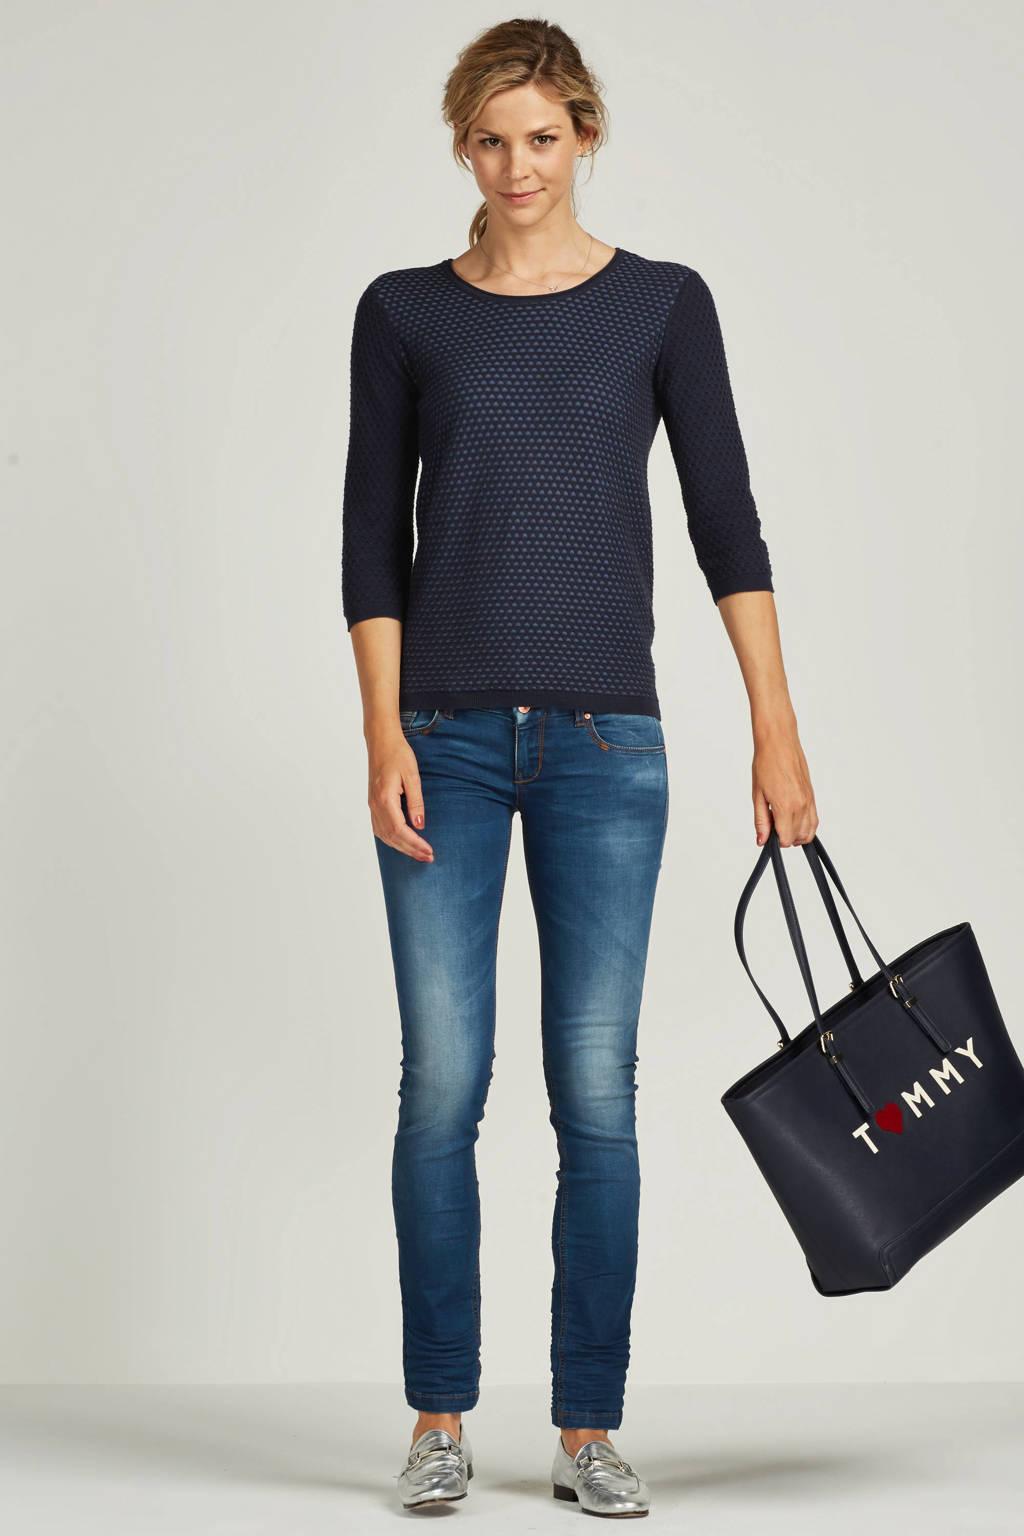 LTB Zena high slim fit jeans, Valoel wash